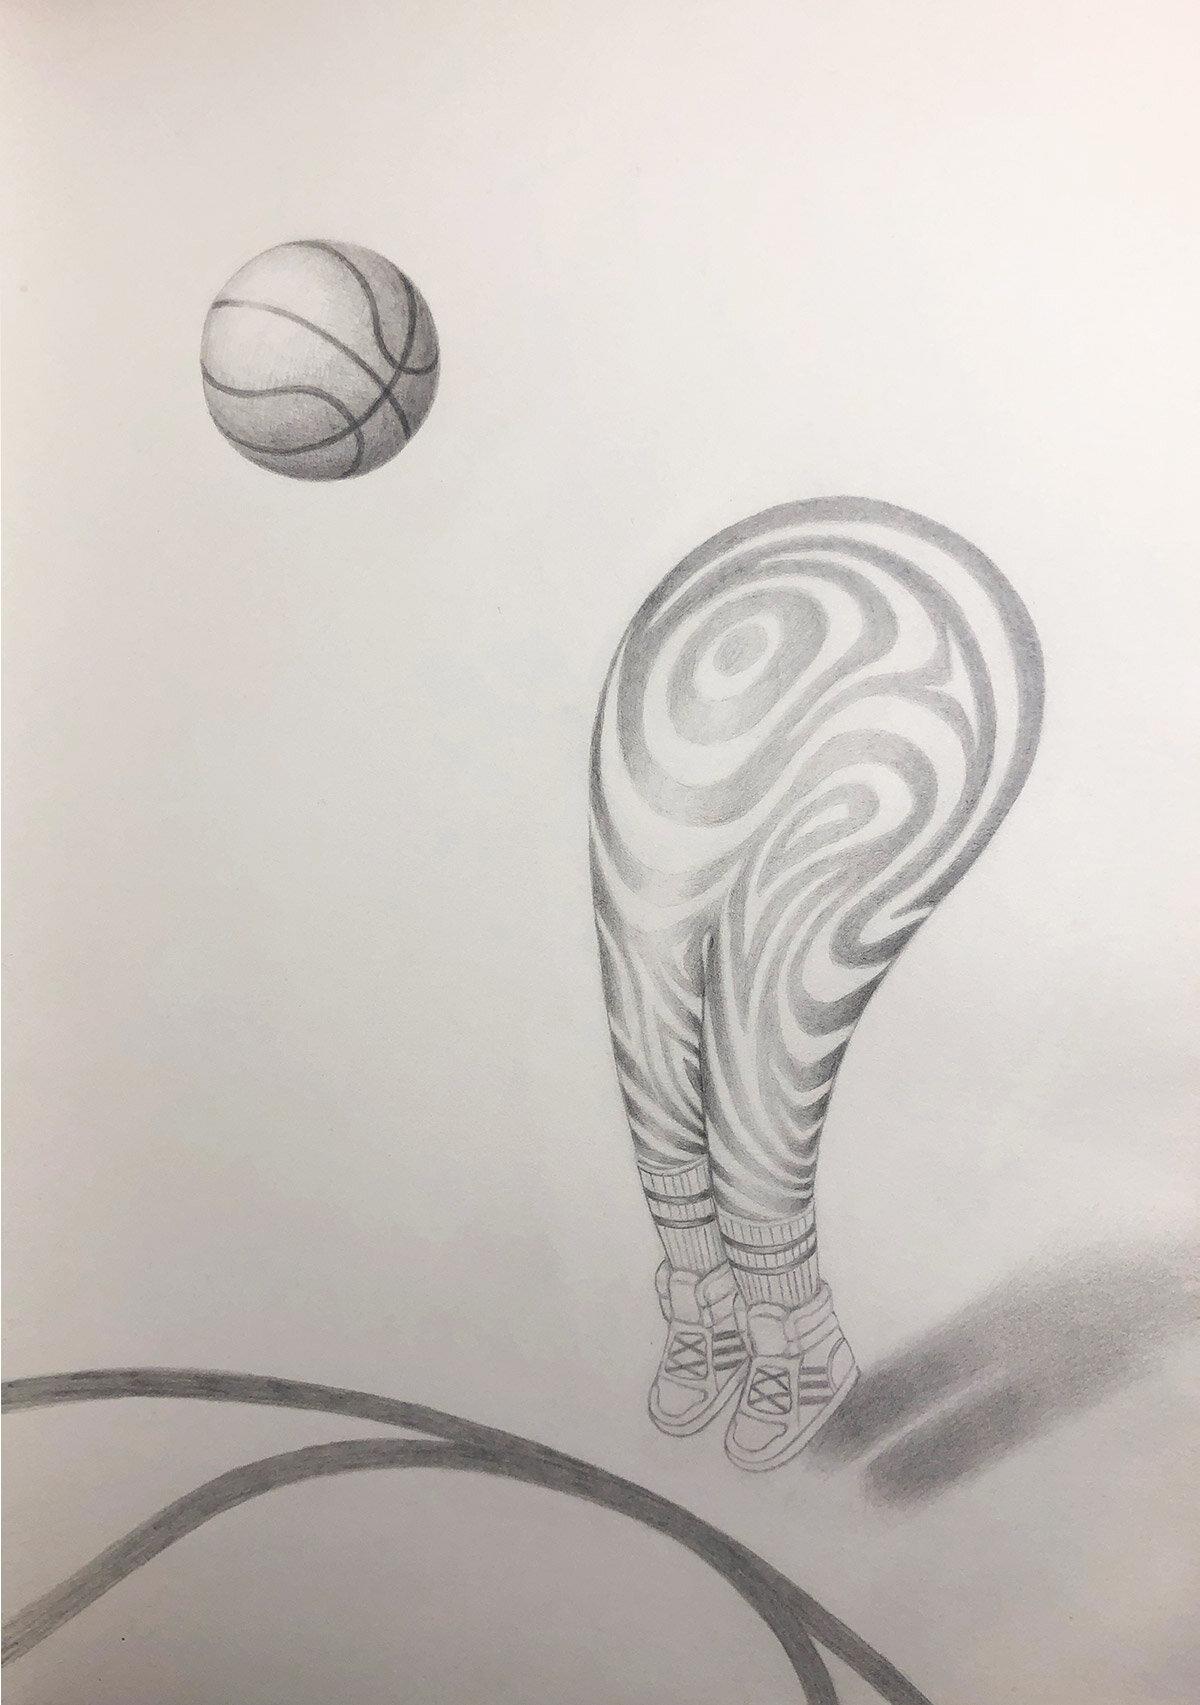 Basketball Blob Character